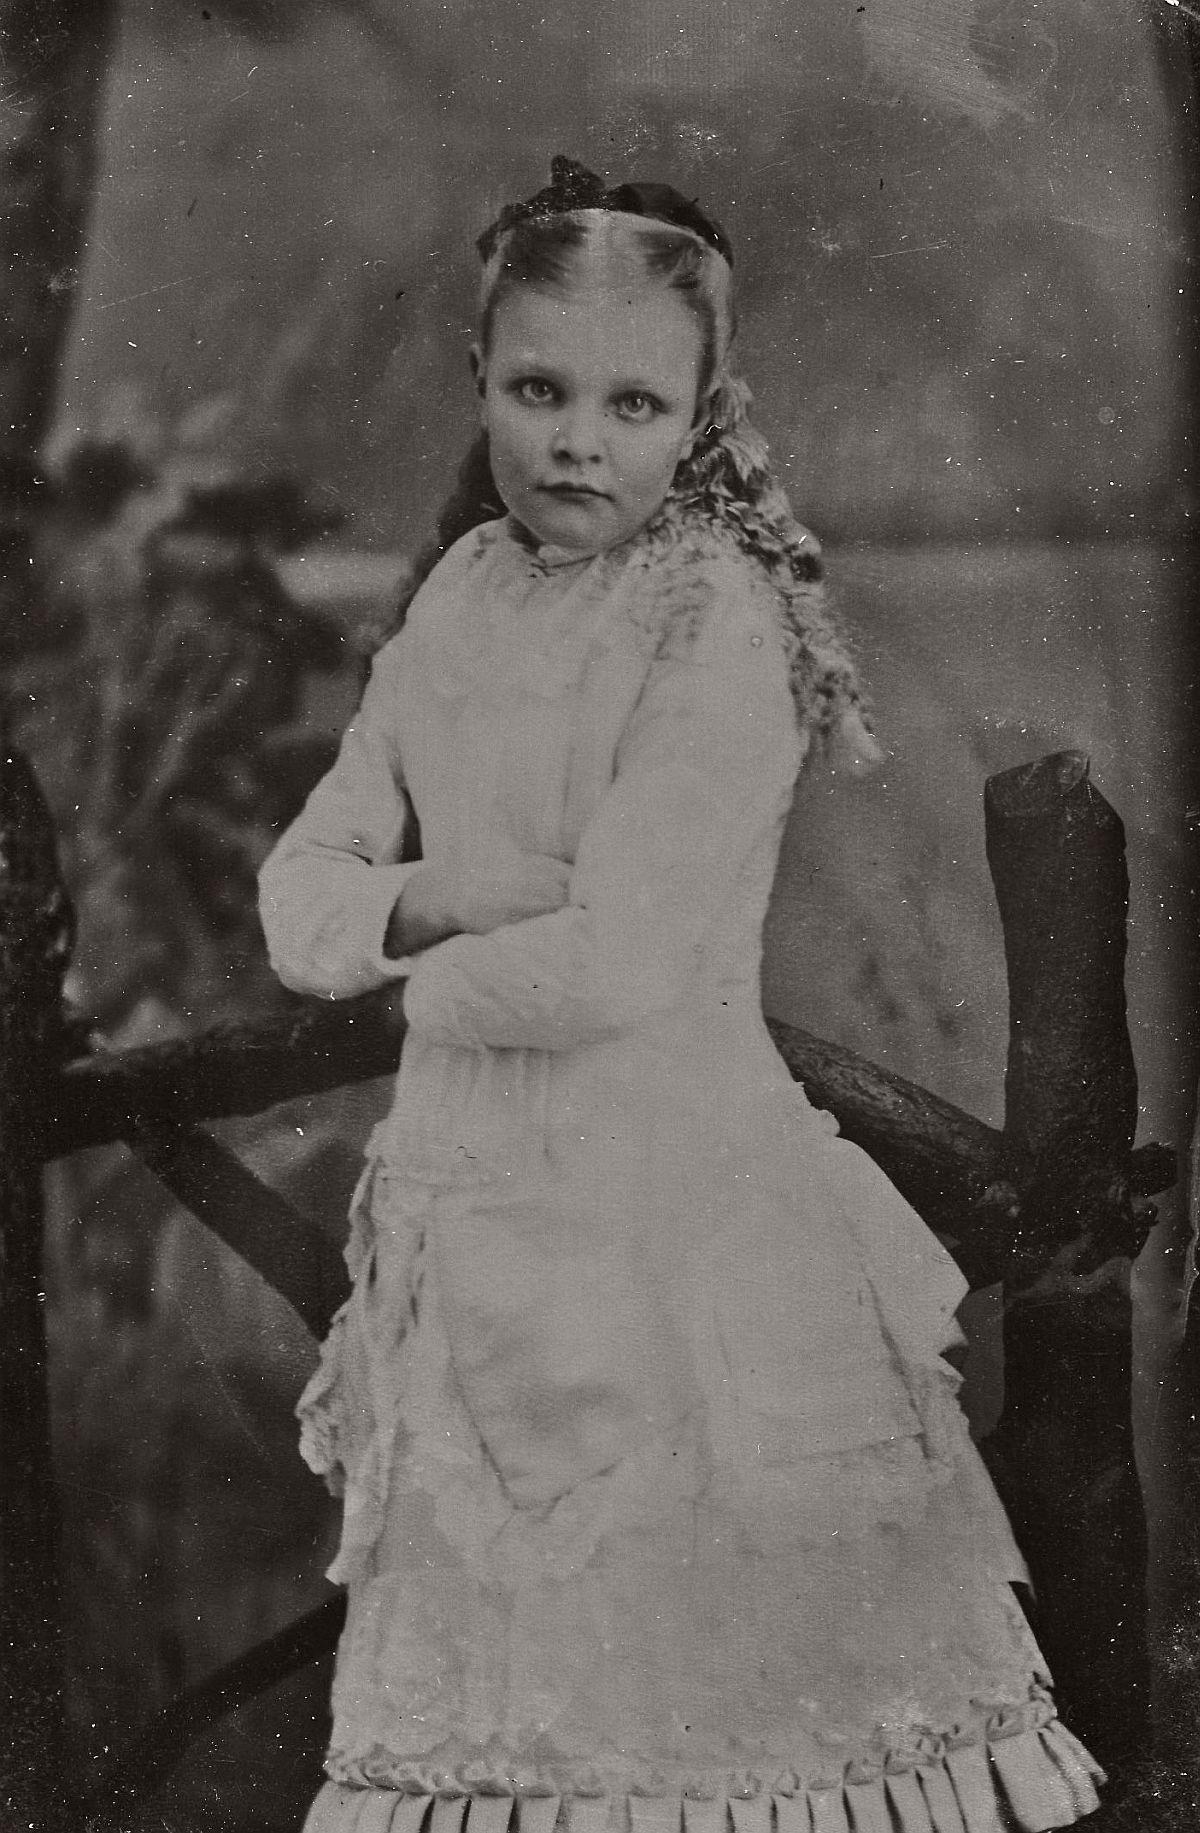 victorian-era-tintype-portraits-of-children-1870s-and-1880s-31